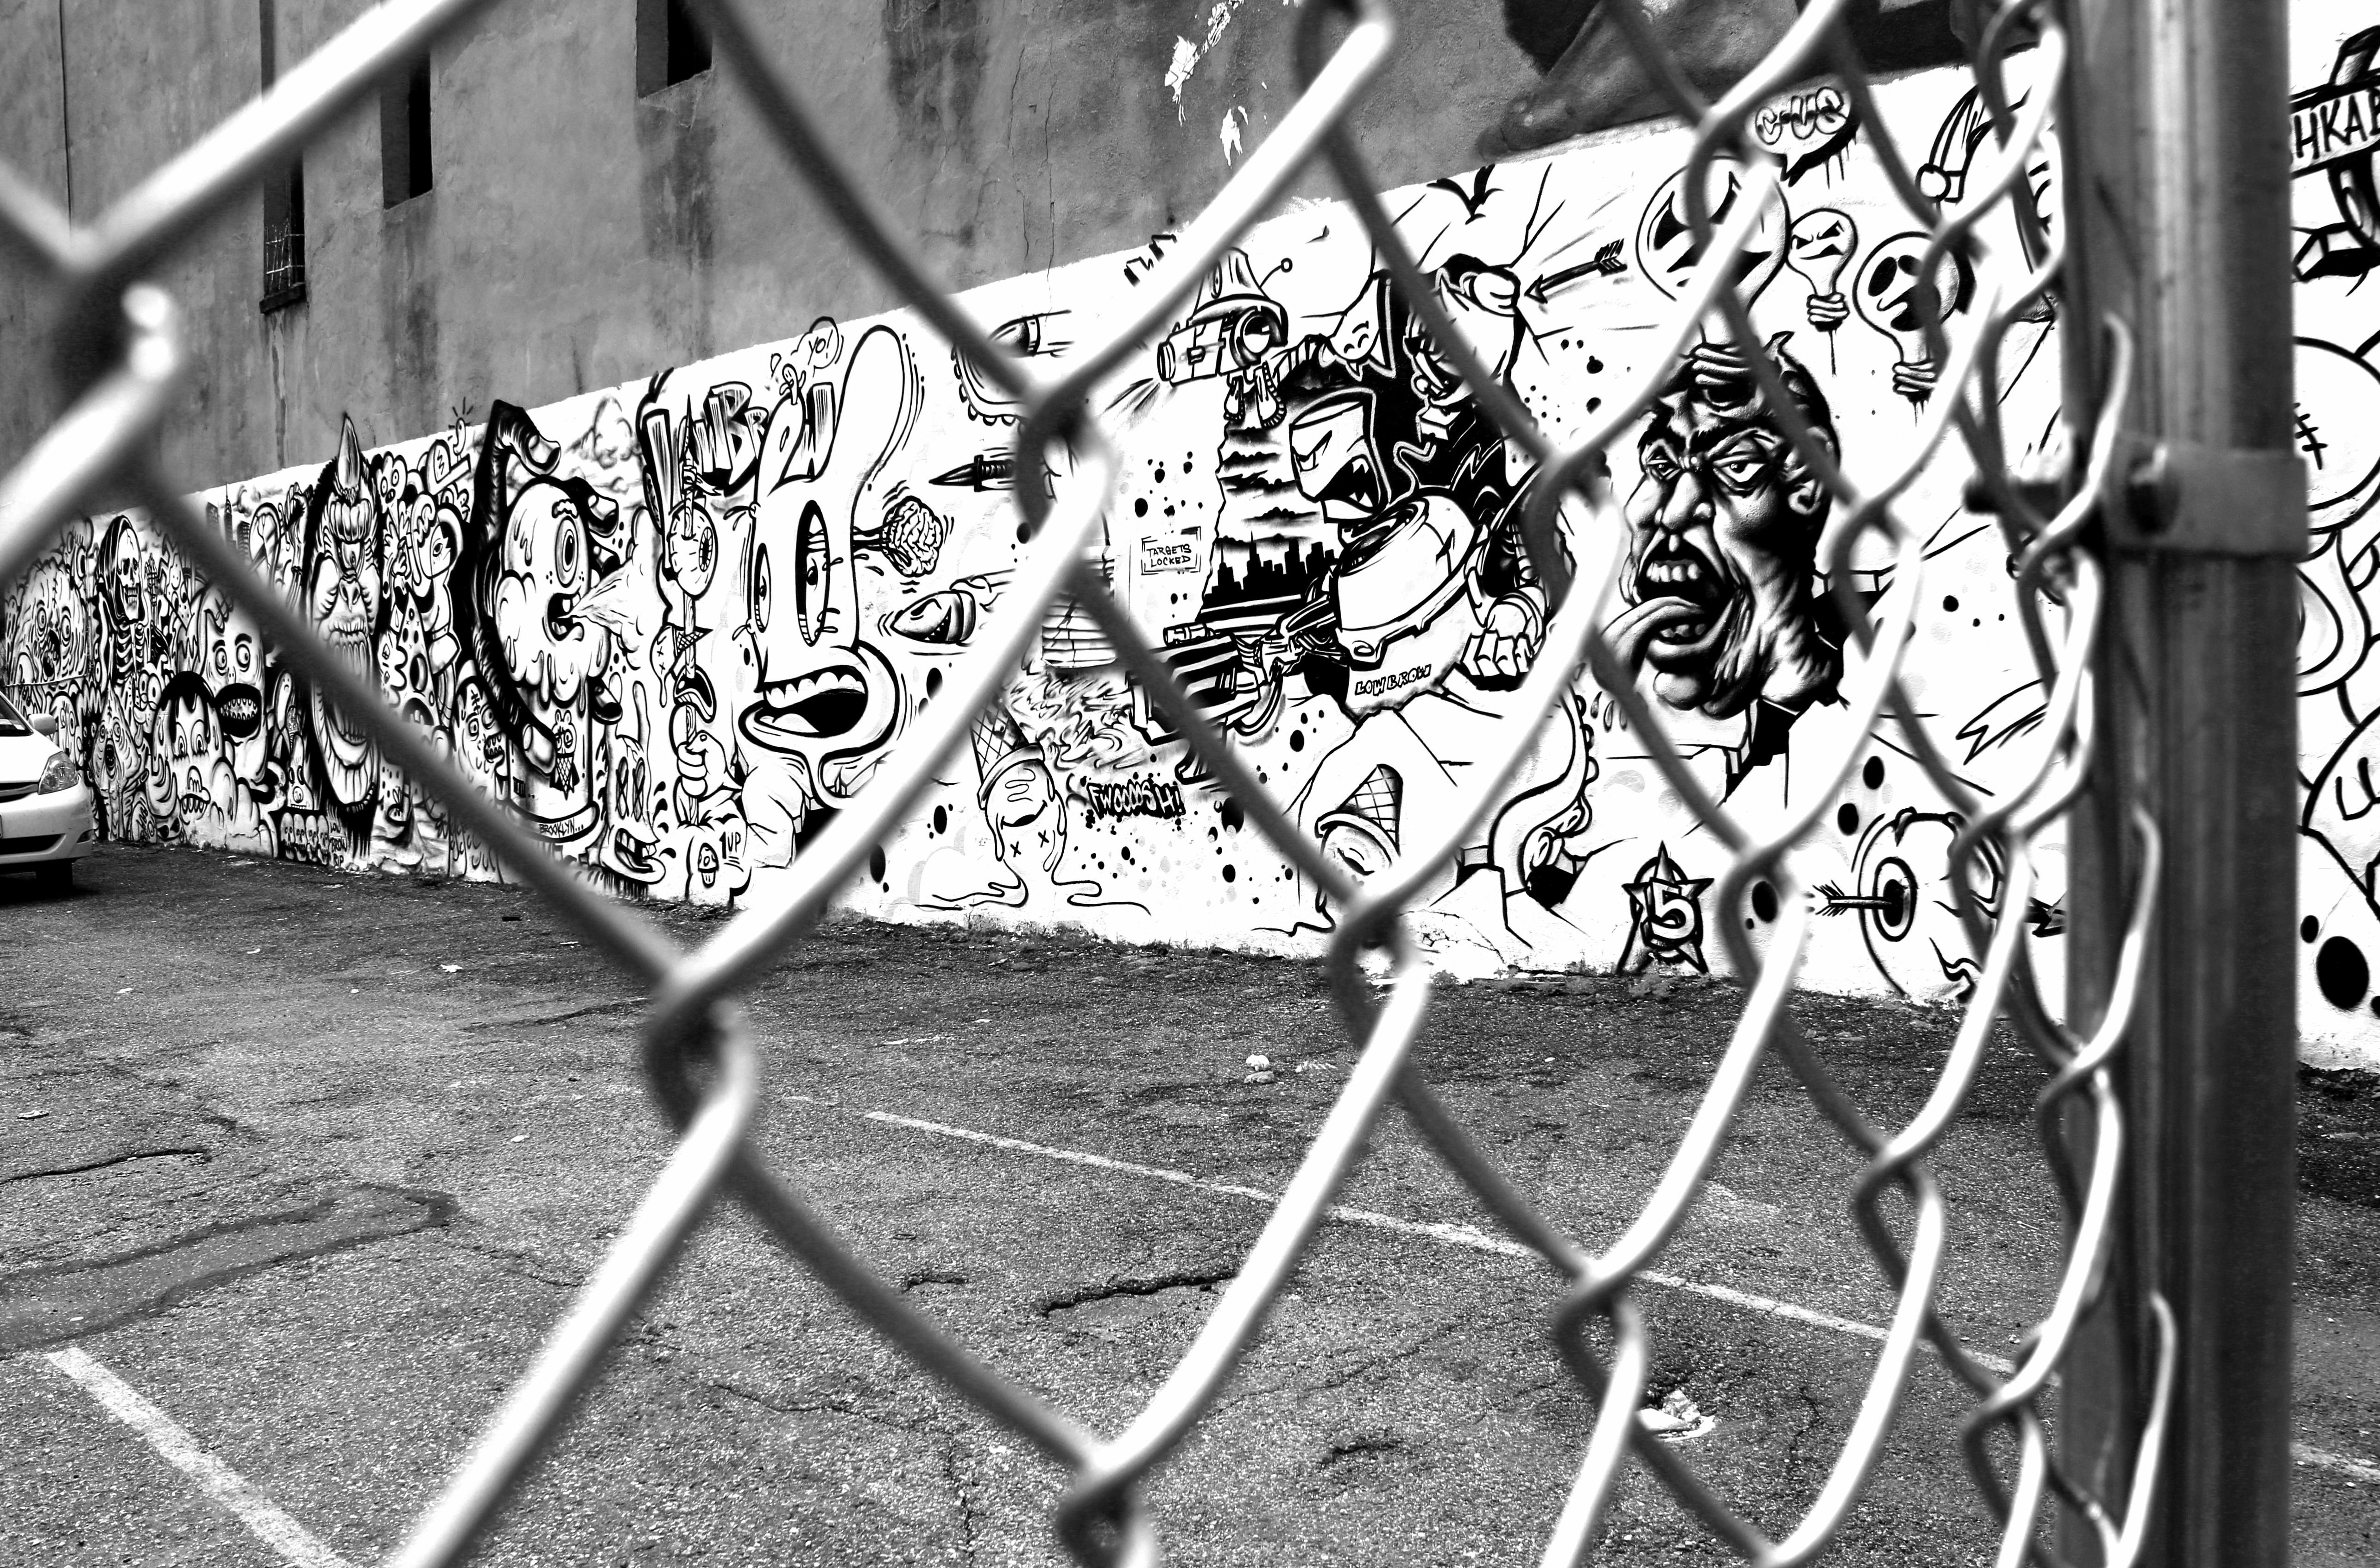 Free Images : black and white, wheel, flower, new york, vehicle ...